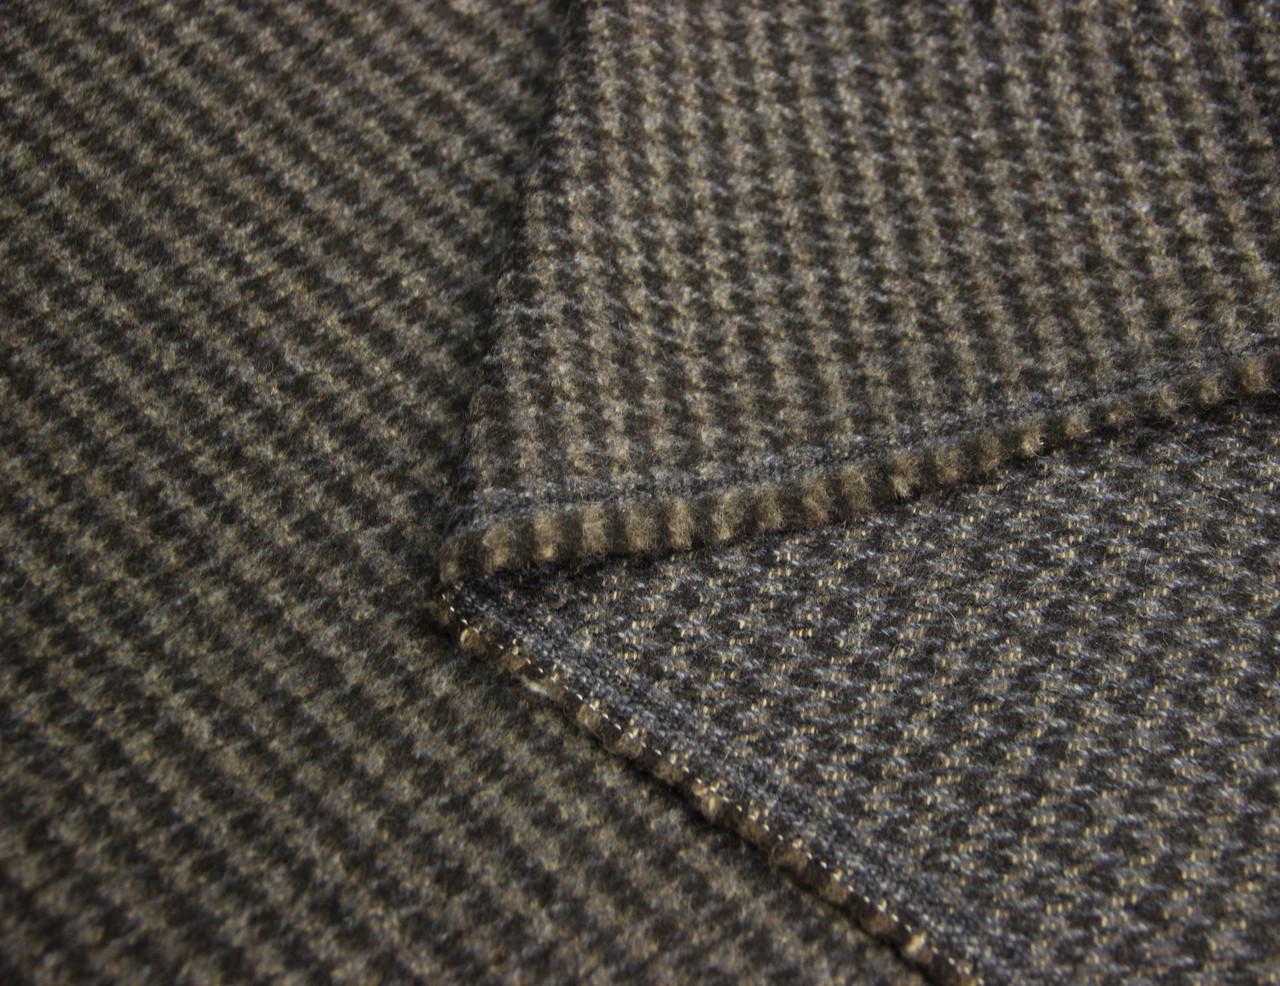 Пальтовая итальянская шерстяная натуральная ткань куриная лапка серо черная CH 172